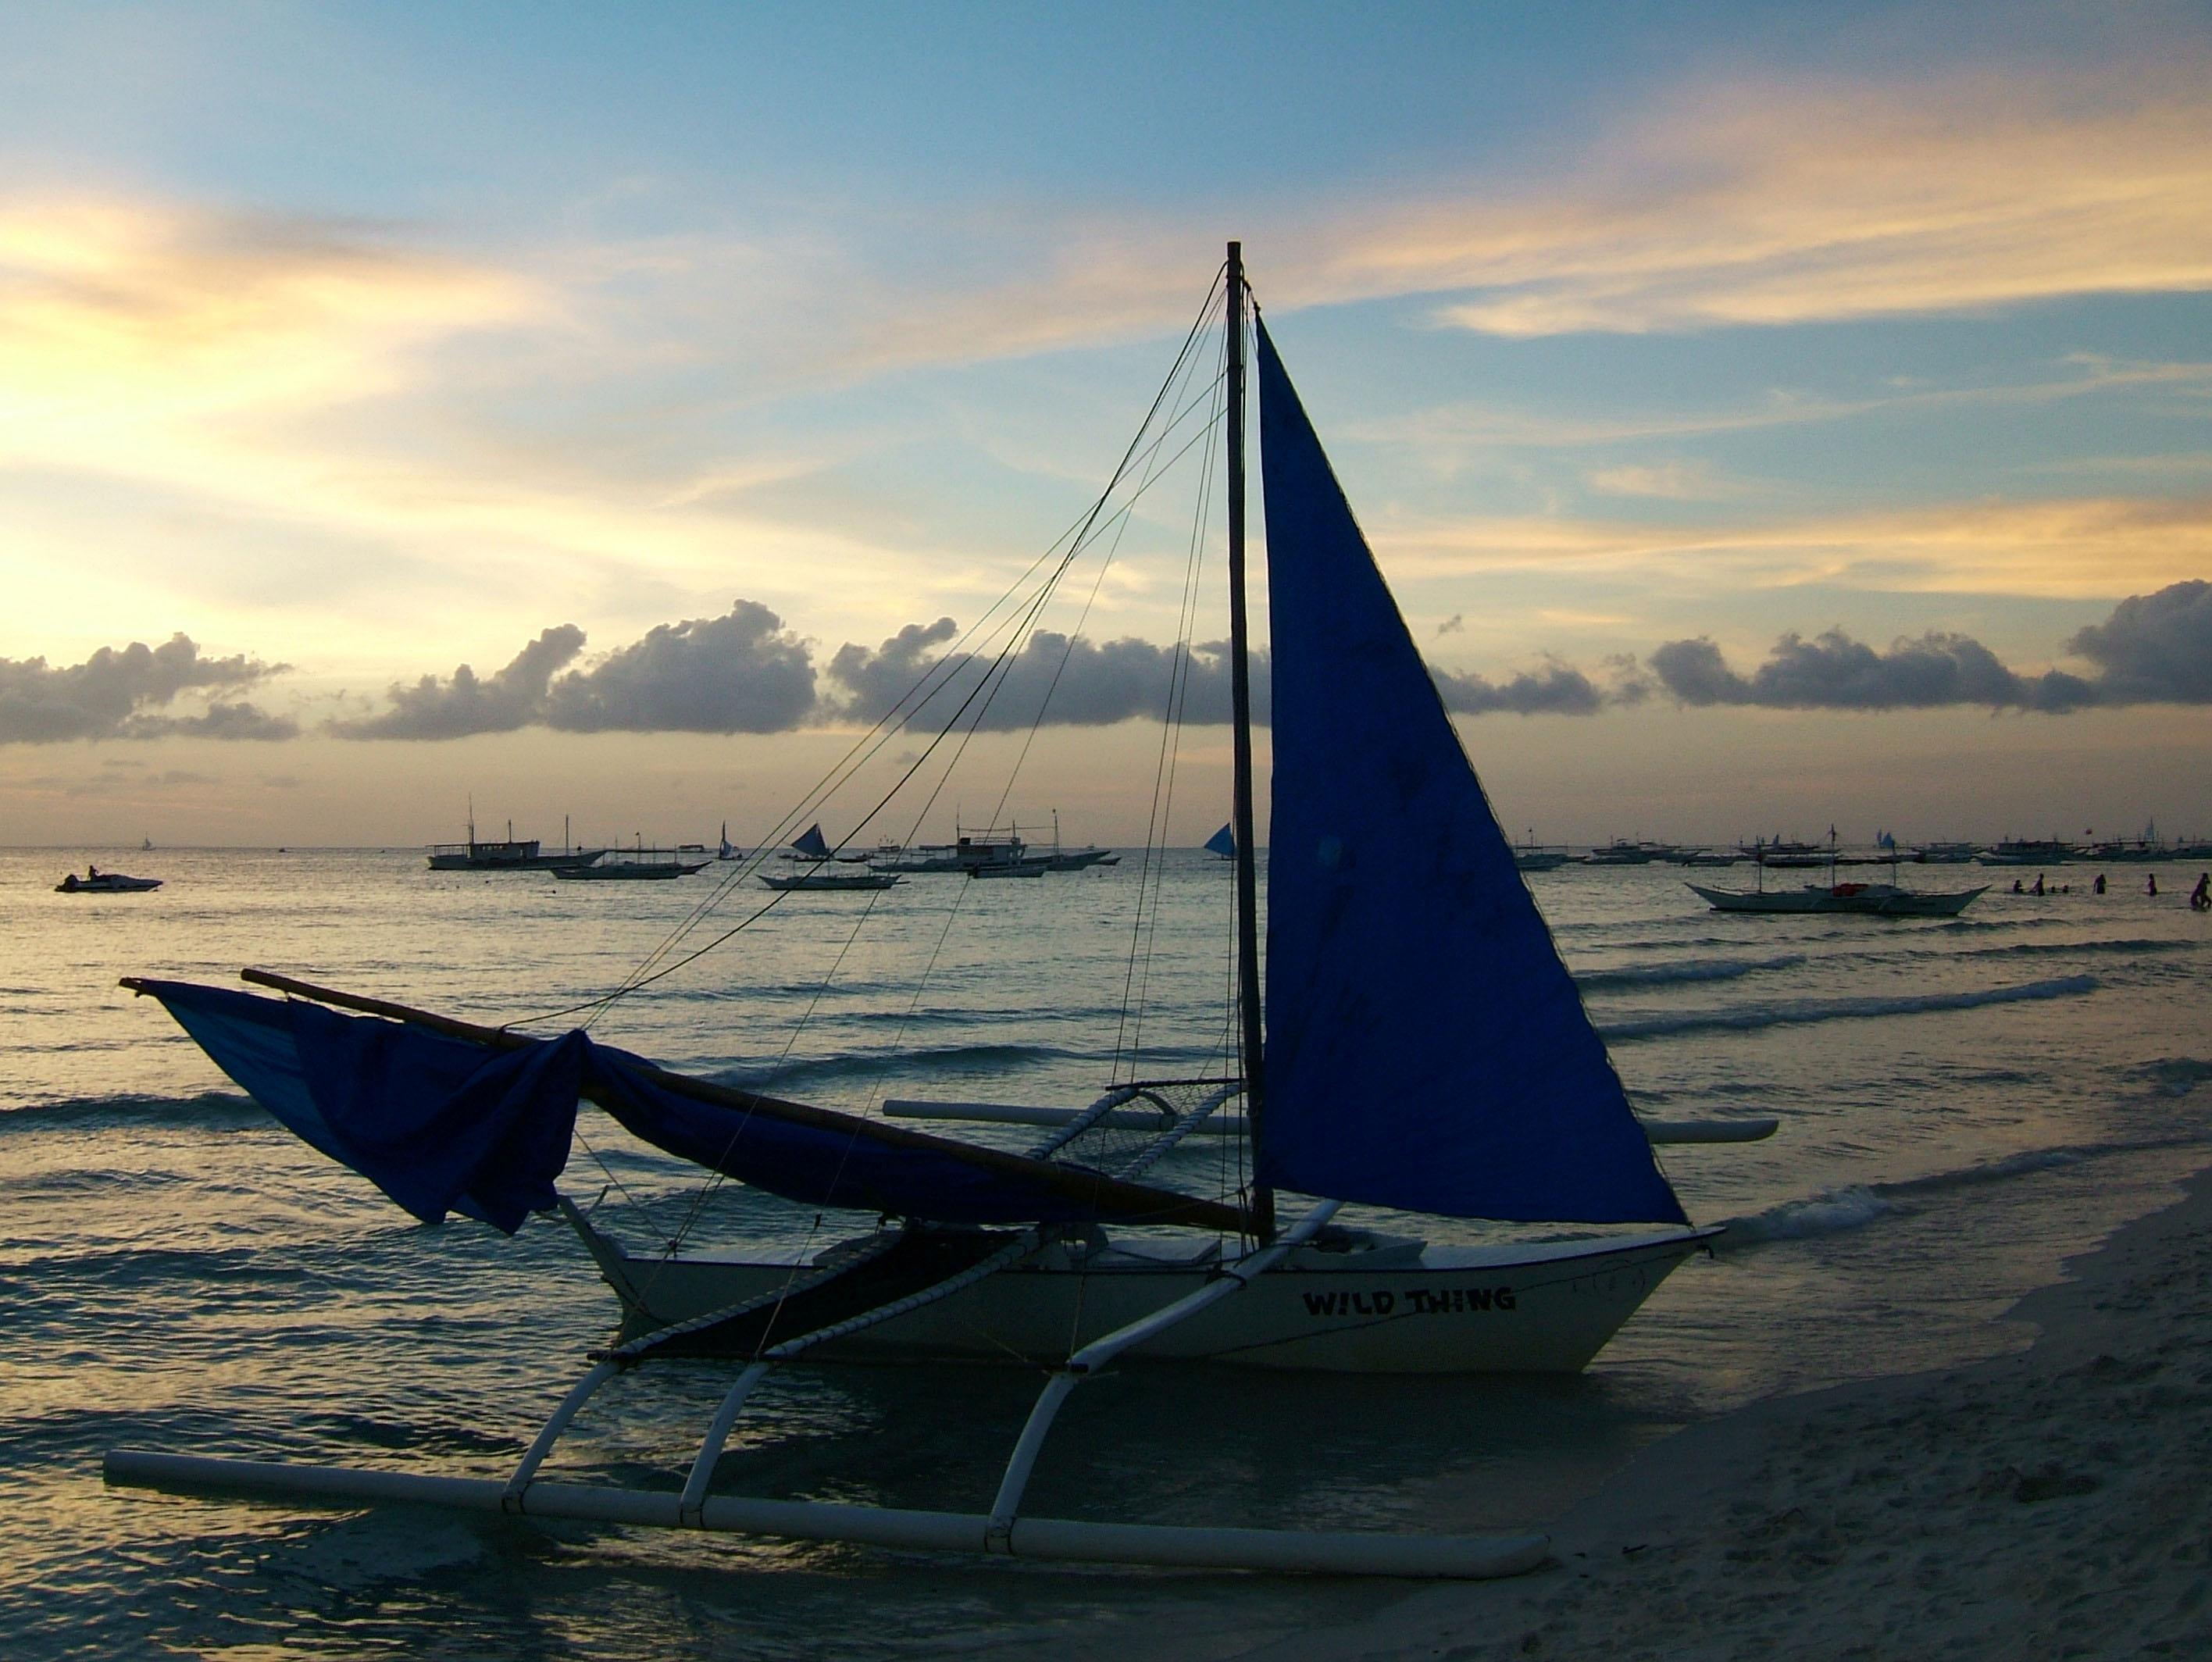 Sunset Philippines Boracay Beach 23